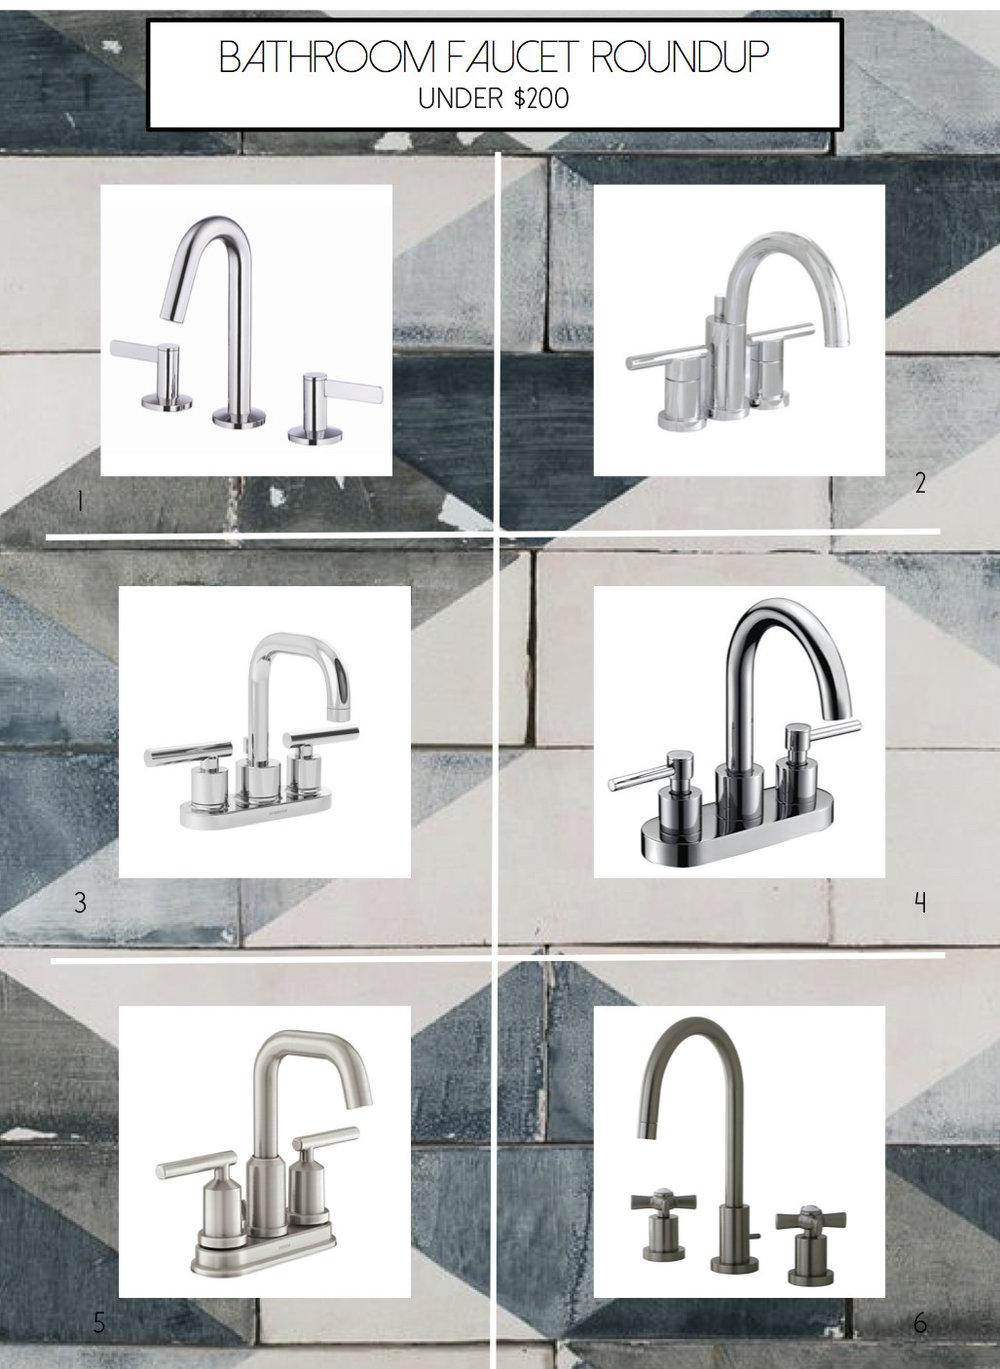 Bathroom-Faucet-Roundup-e1457536941324.jpg